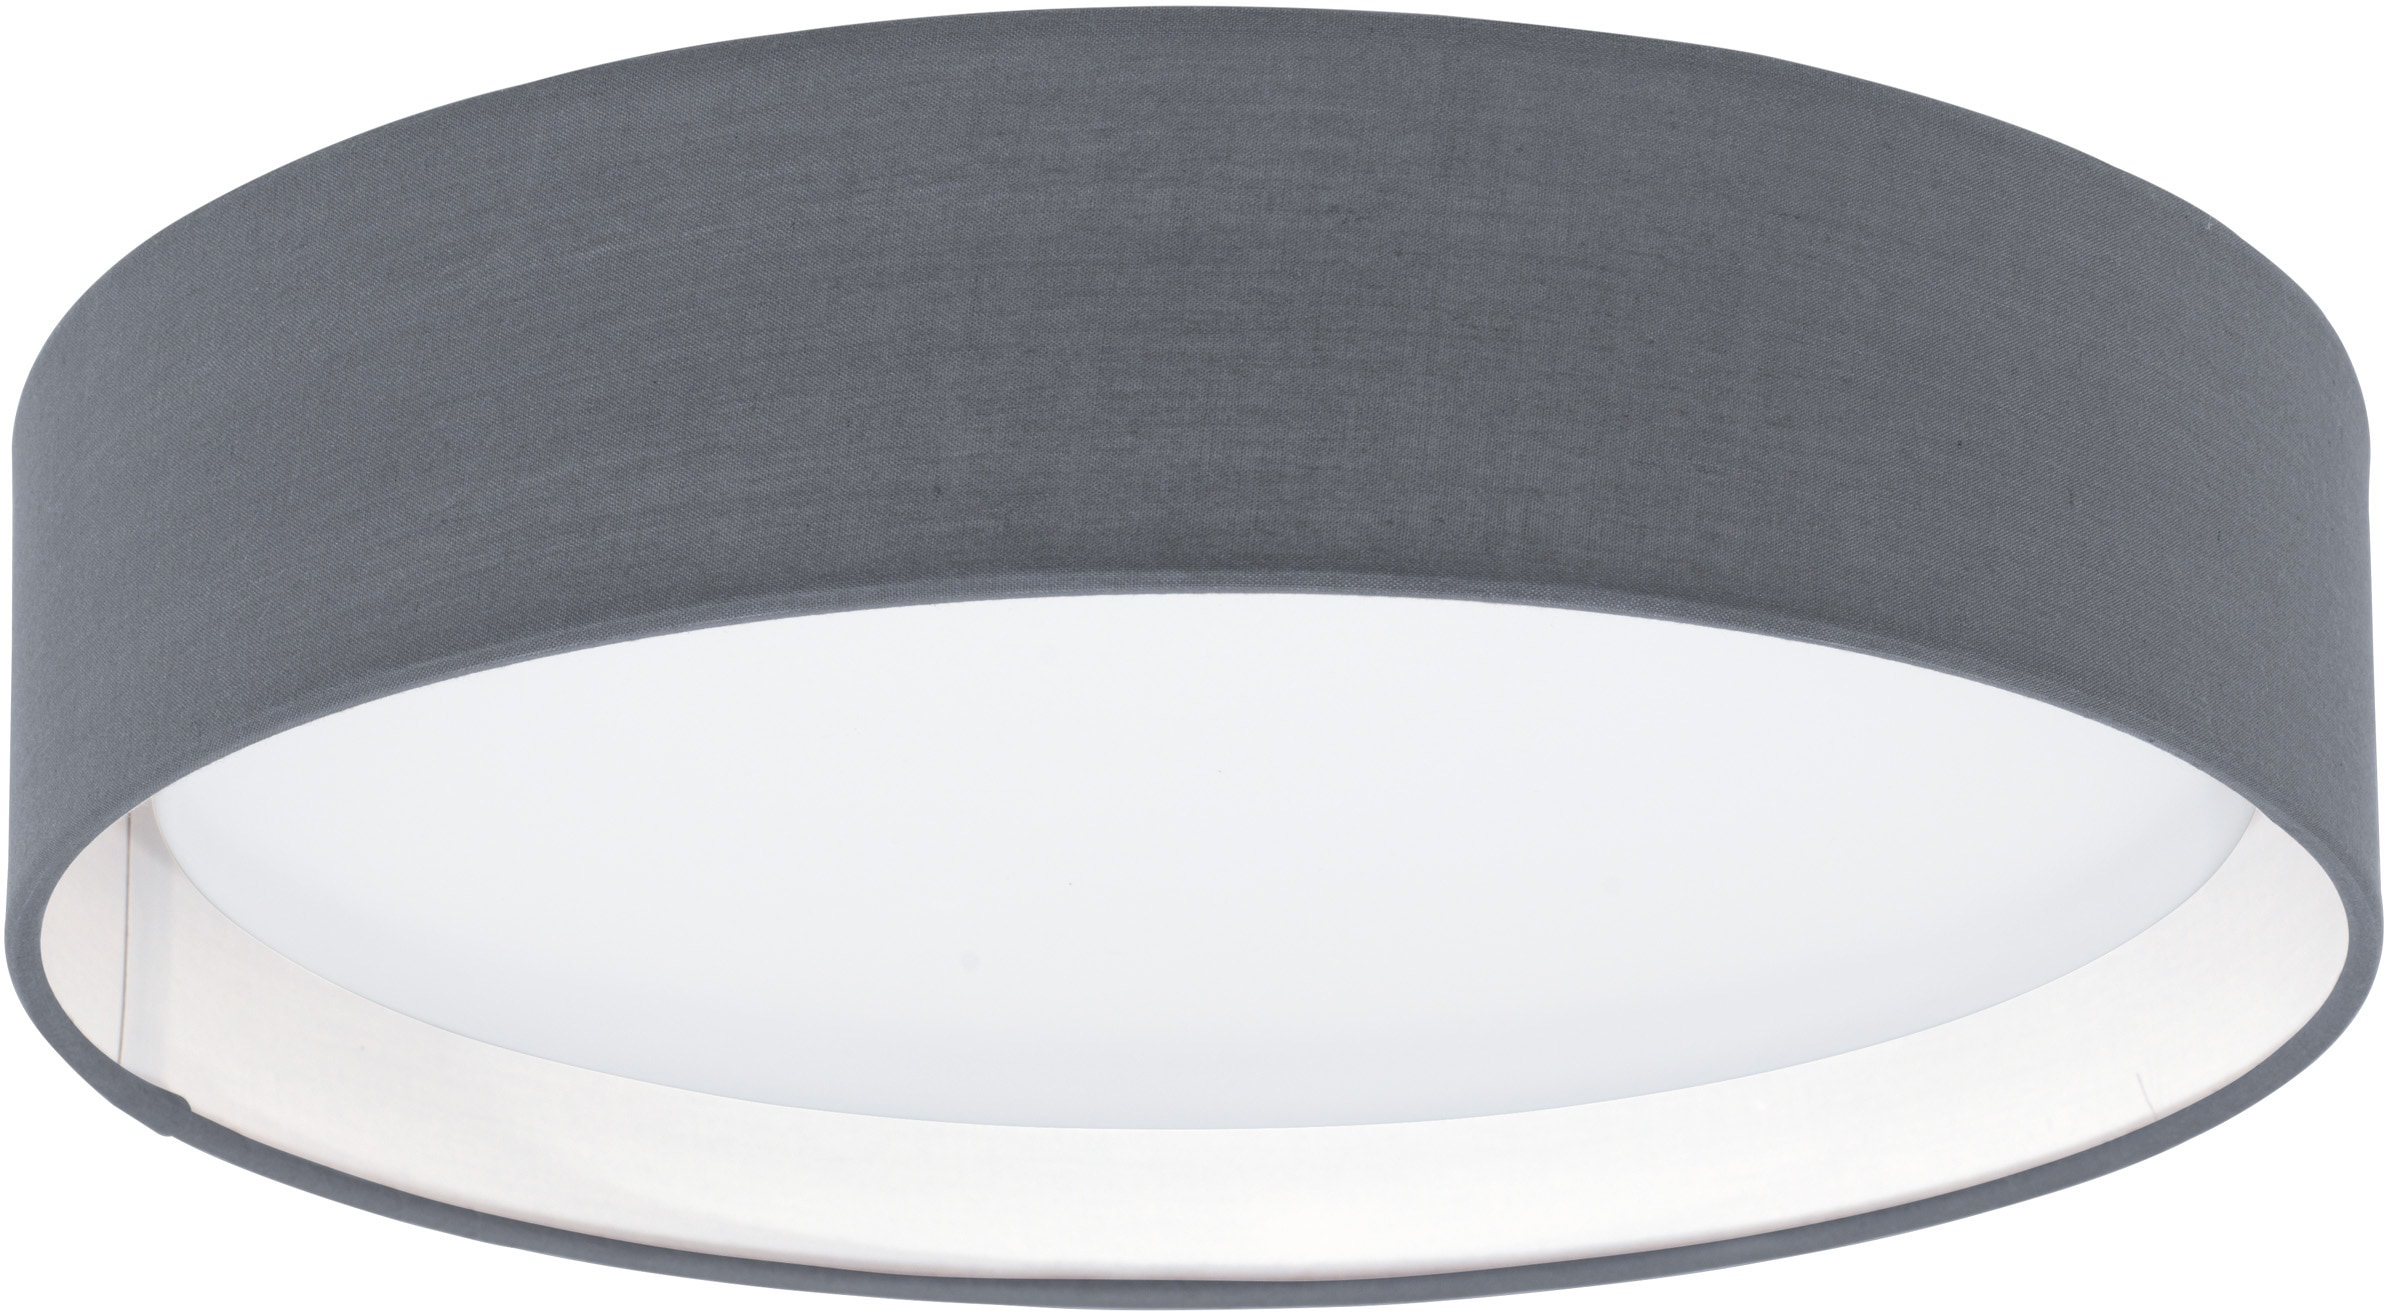 EGLO Deckenleuchte PASTERI, LED-Board, Warmweiß, LED tauschbar